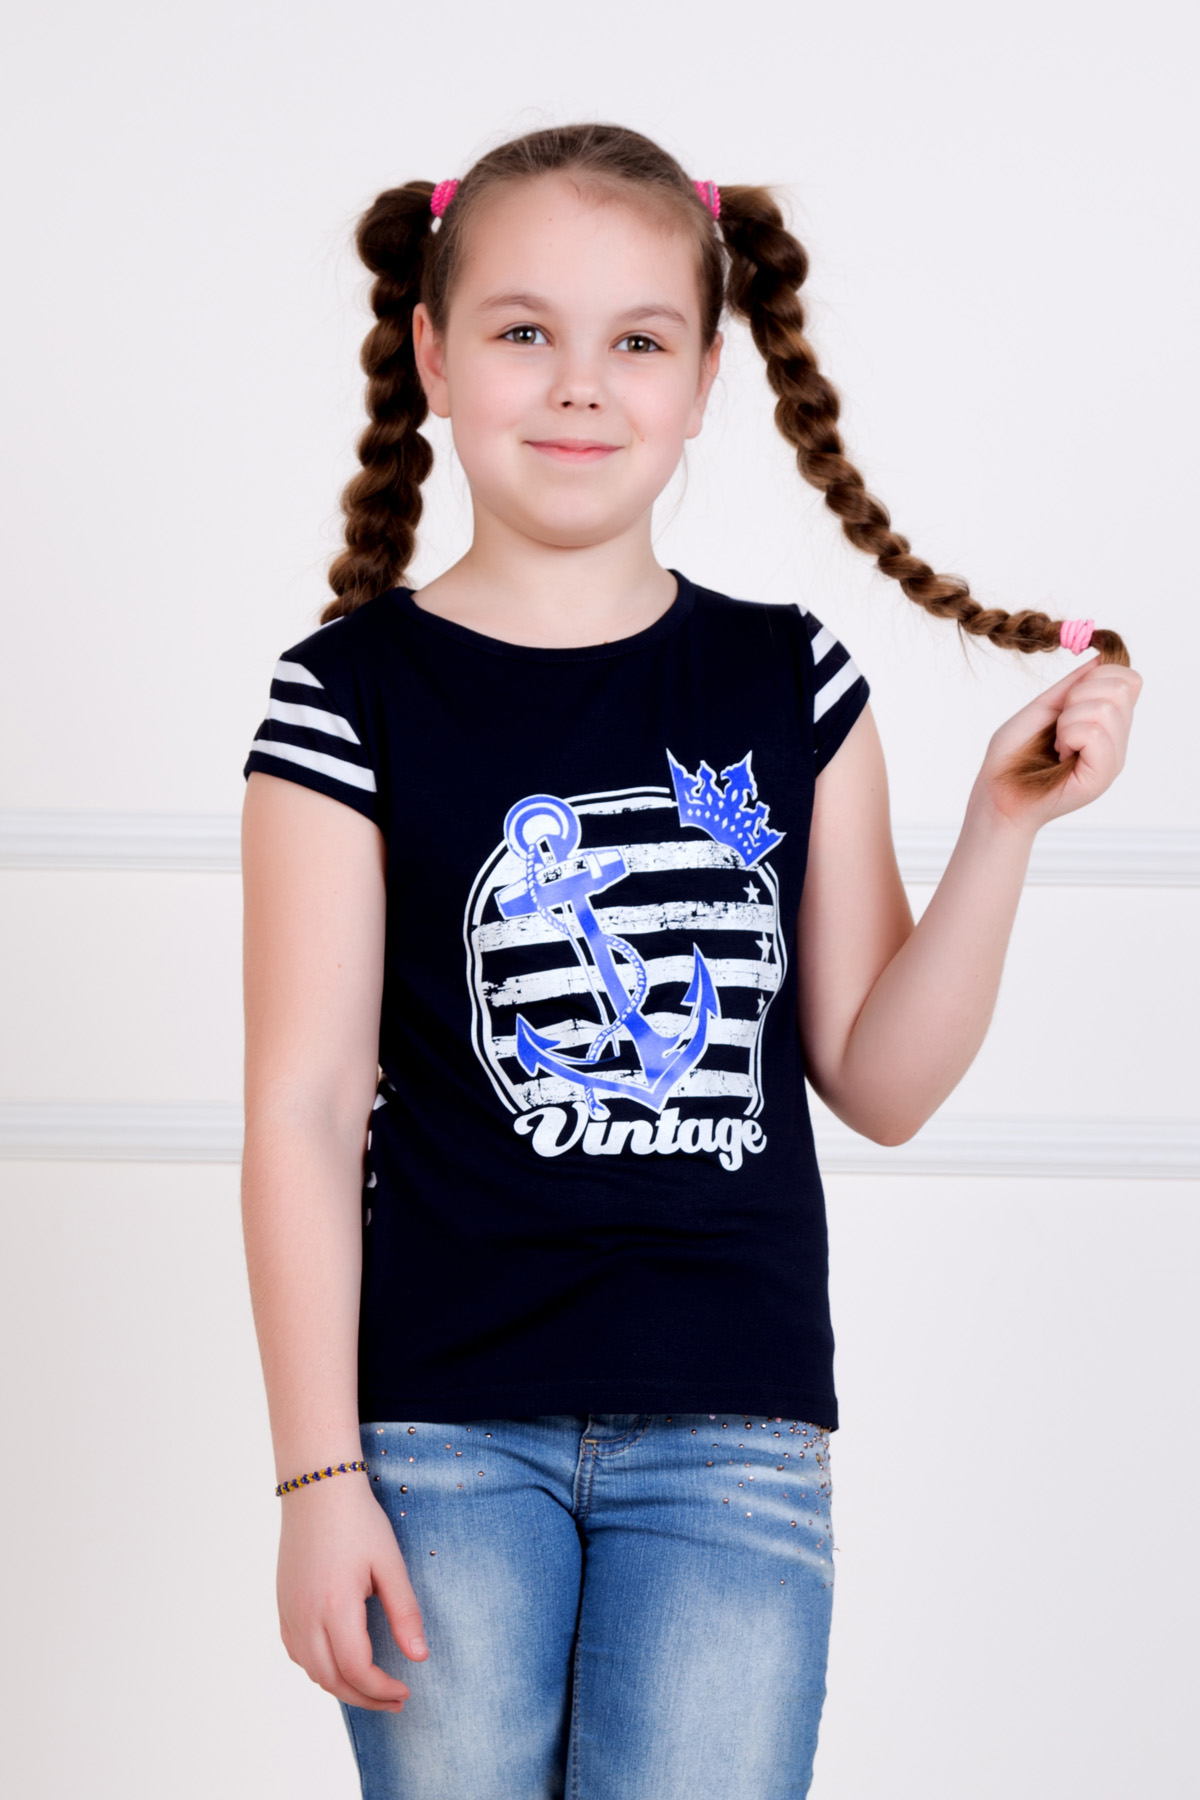 Дет. футболка Якорек р. 36Майки и футболки<br><br><br>Тип: Дет. футболка<br>Размер: 36<br>Материал: Вискоза